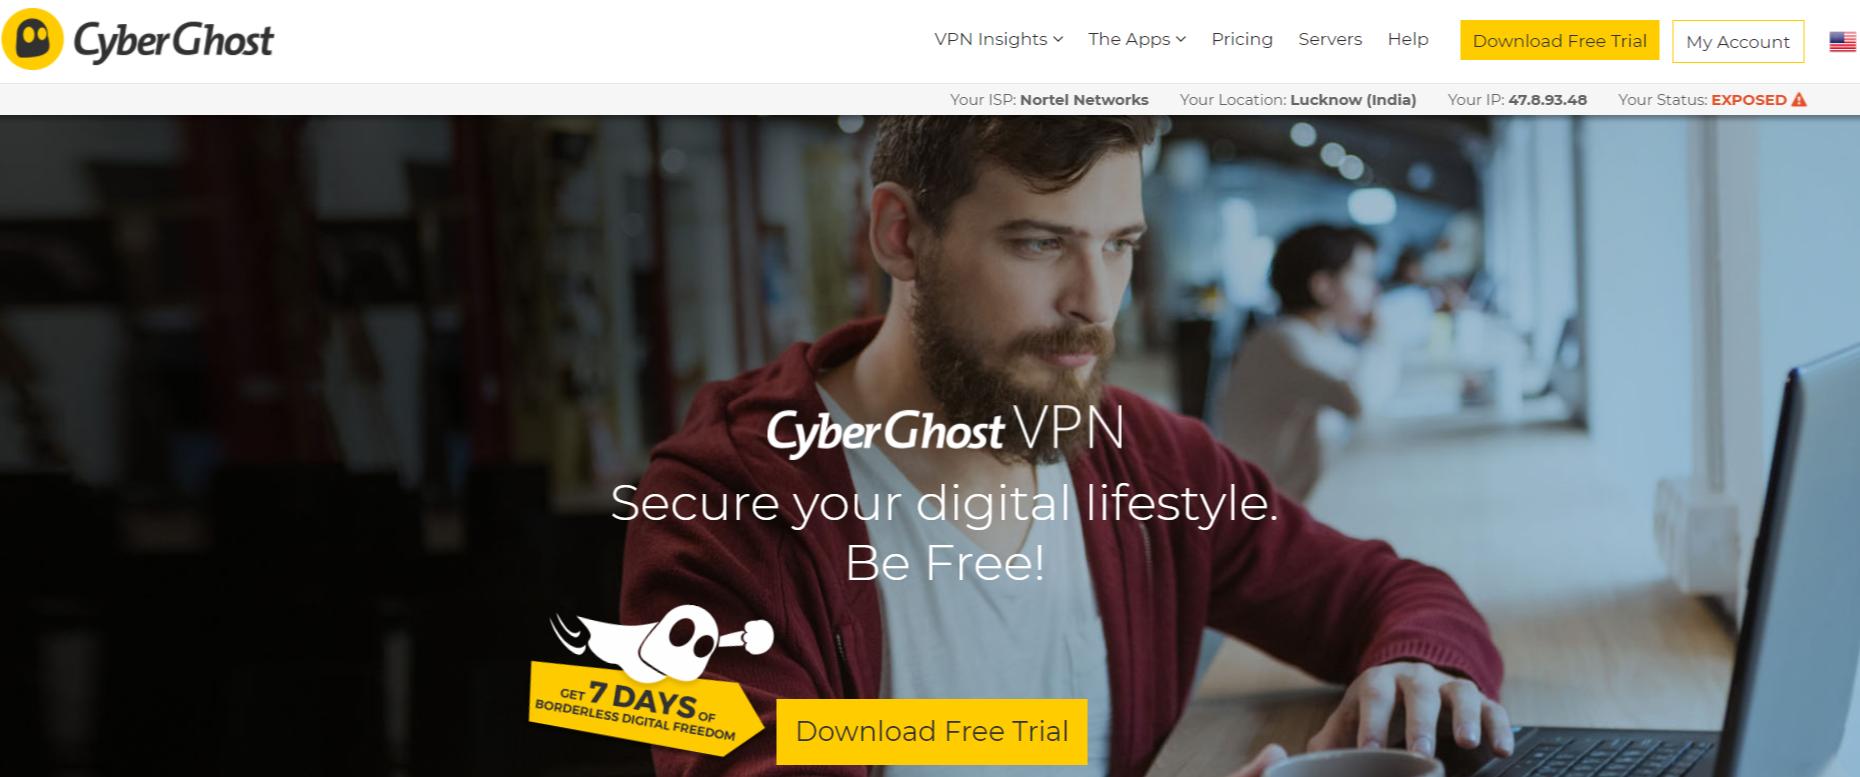 CyberGhost VPN- Best VPN For Egypt